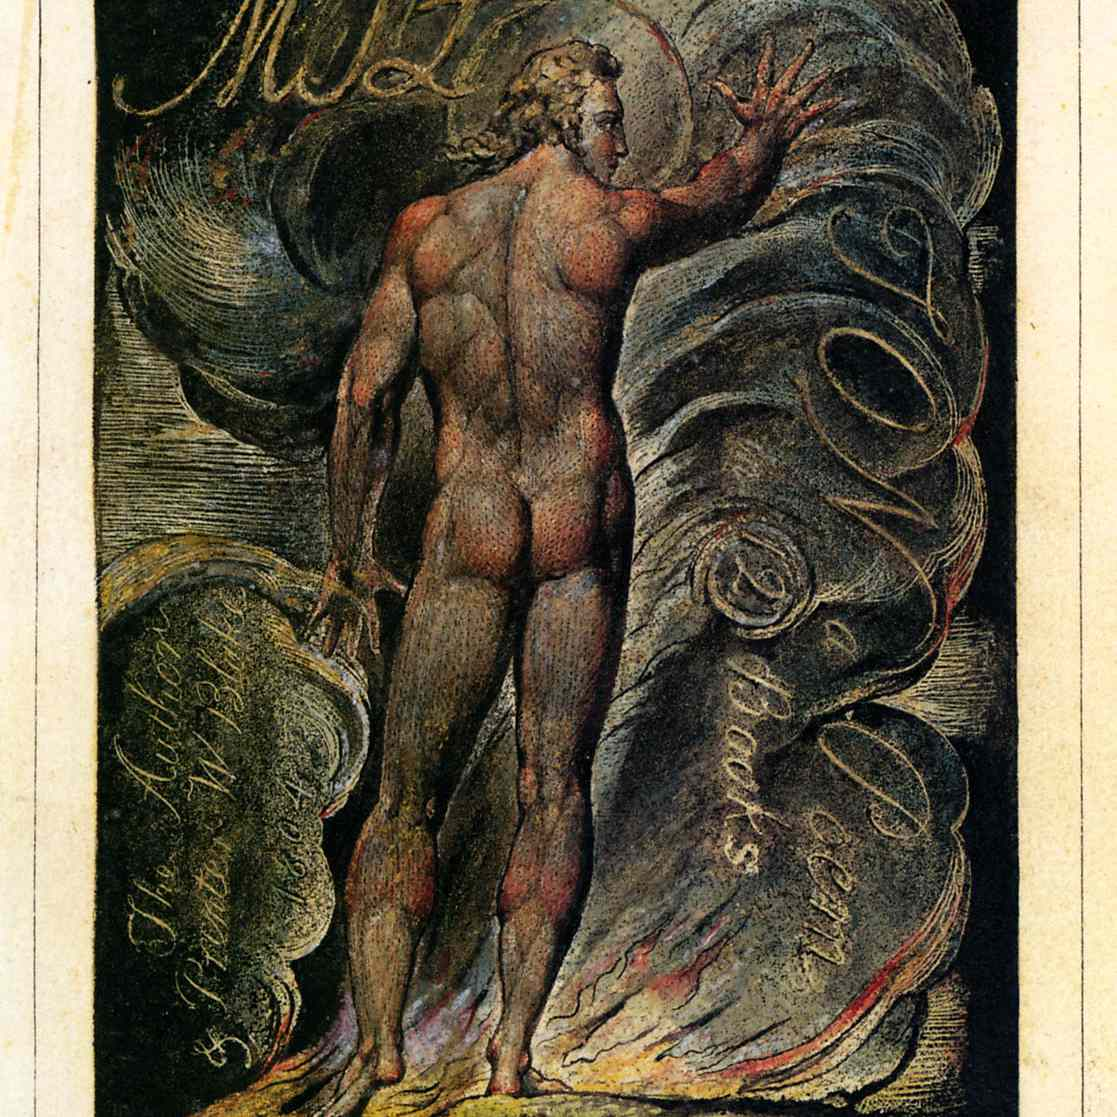 'Milton a poem' by William Blake